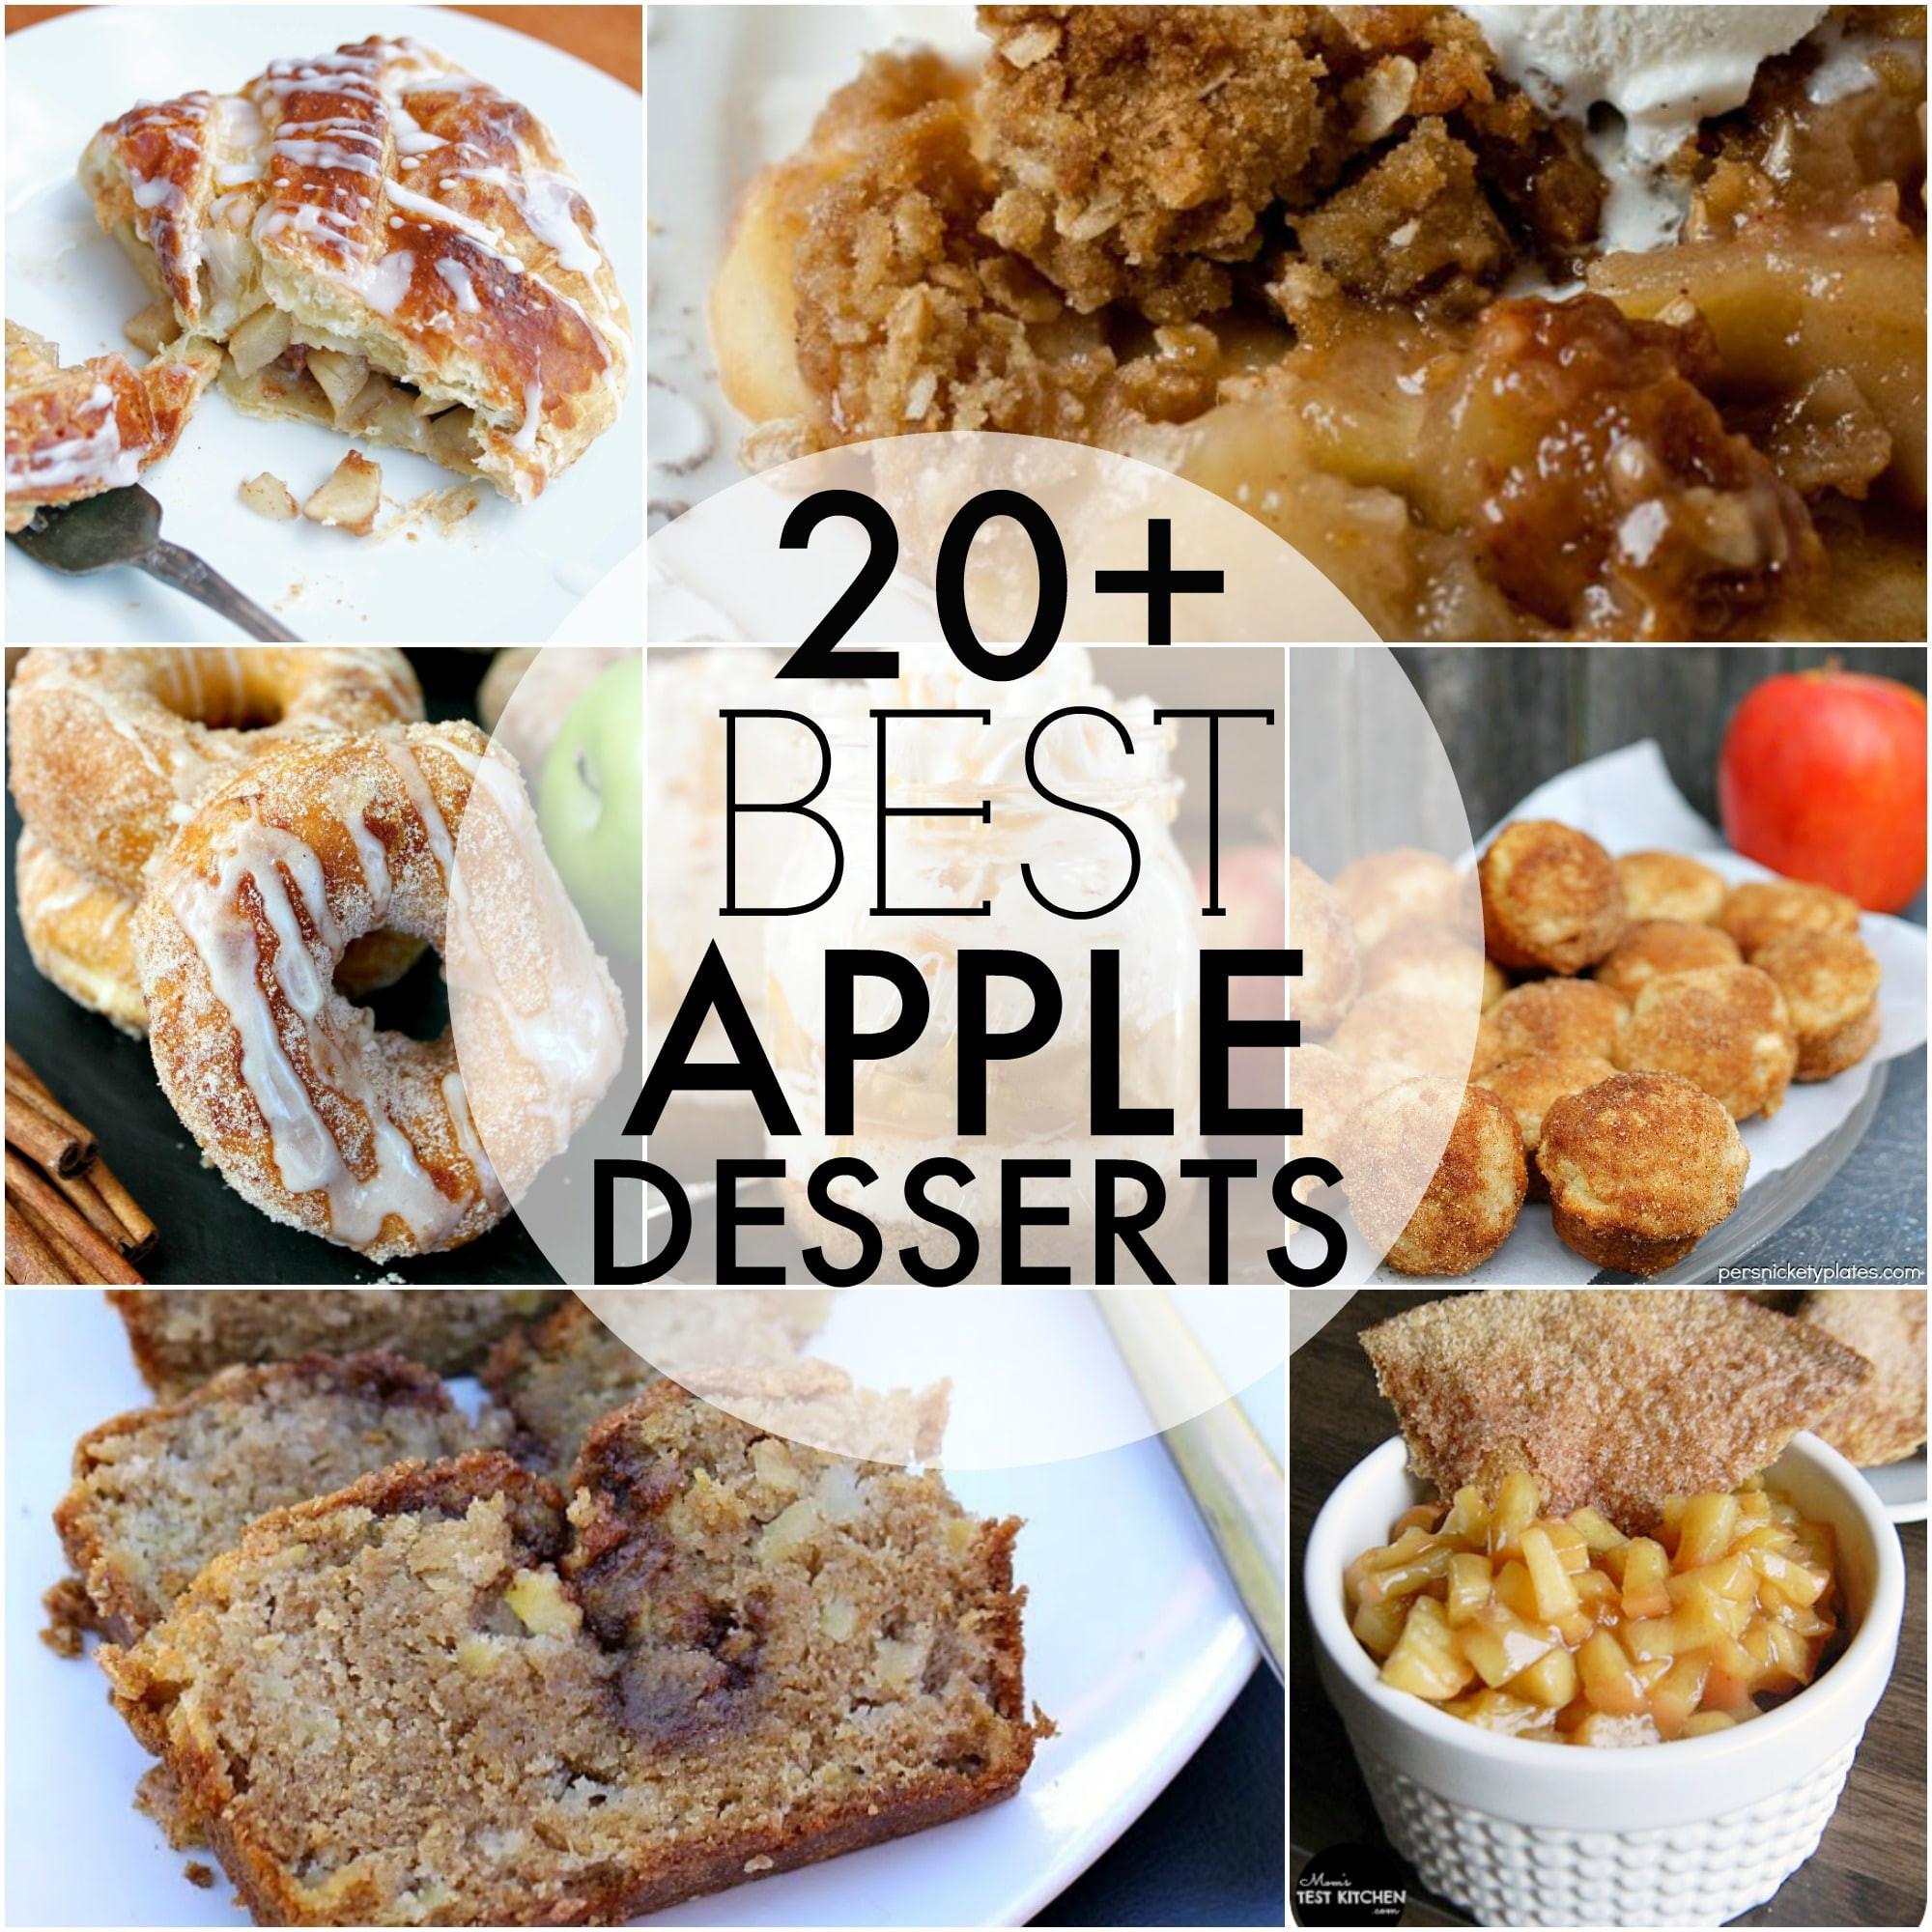 Best Apple Desserts  The BEST Apple Desserts Persnickety Plates